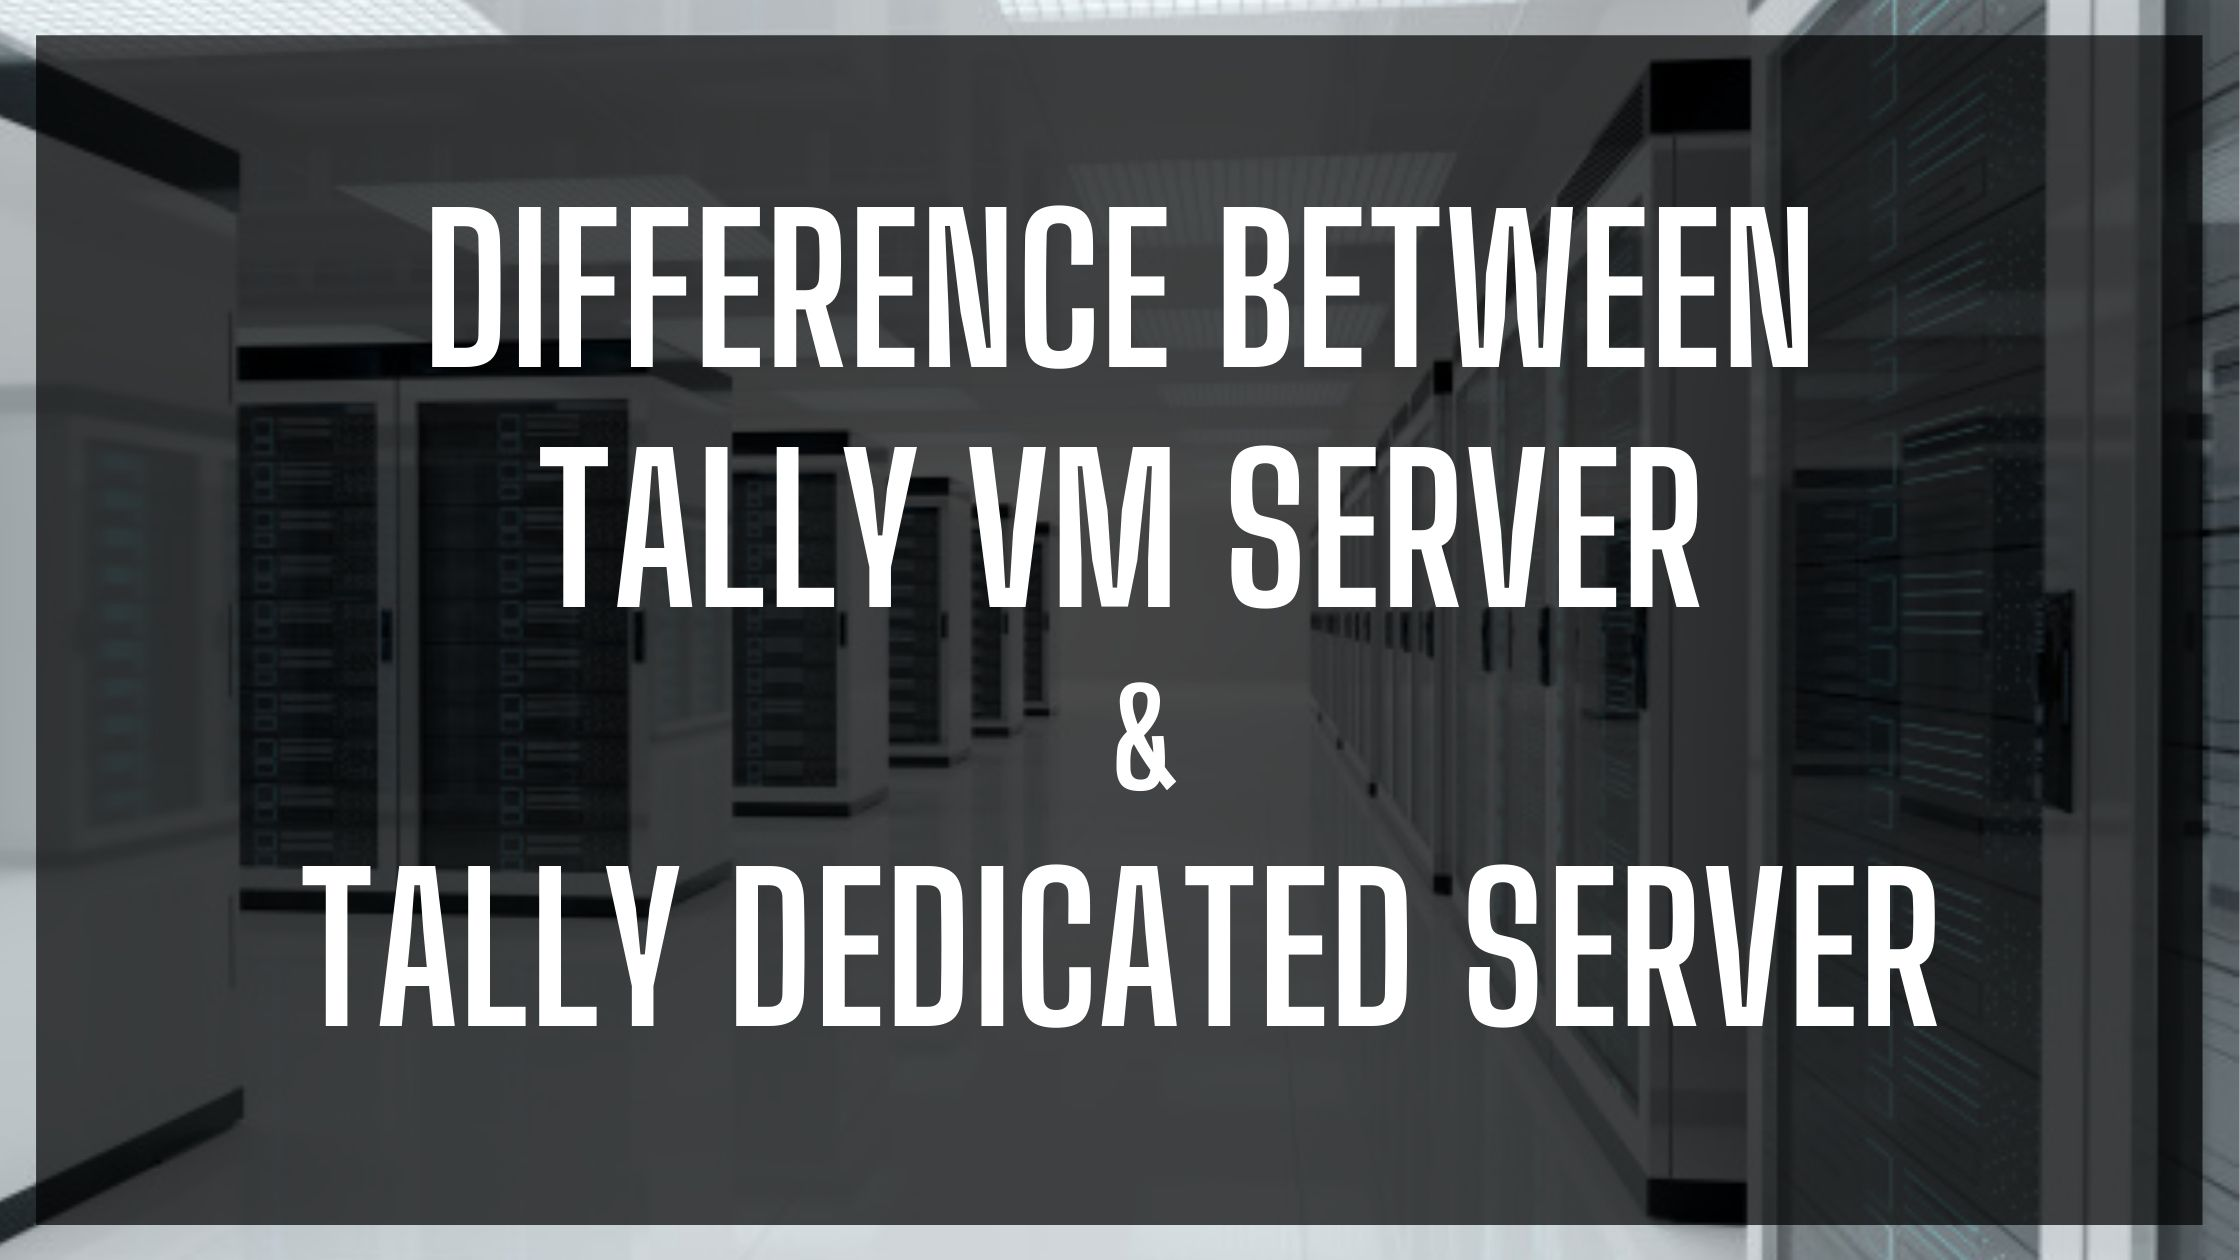 TAlly VM or Tally Dedicated server